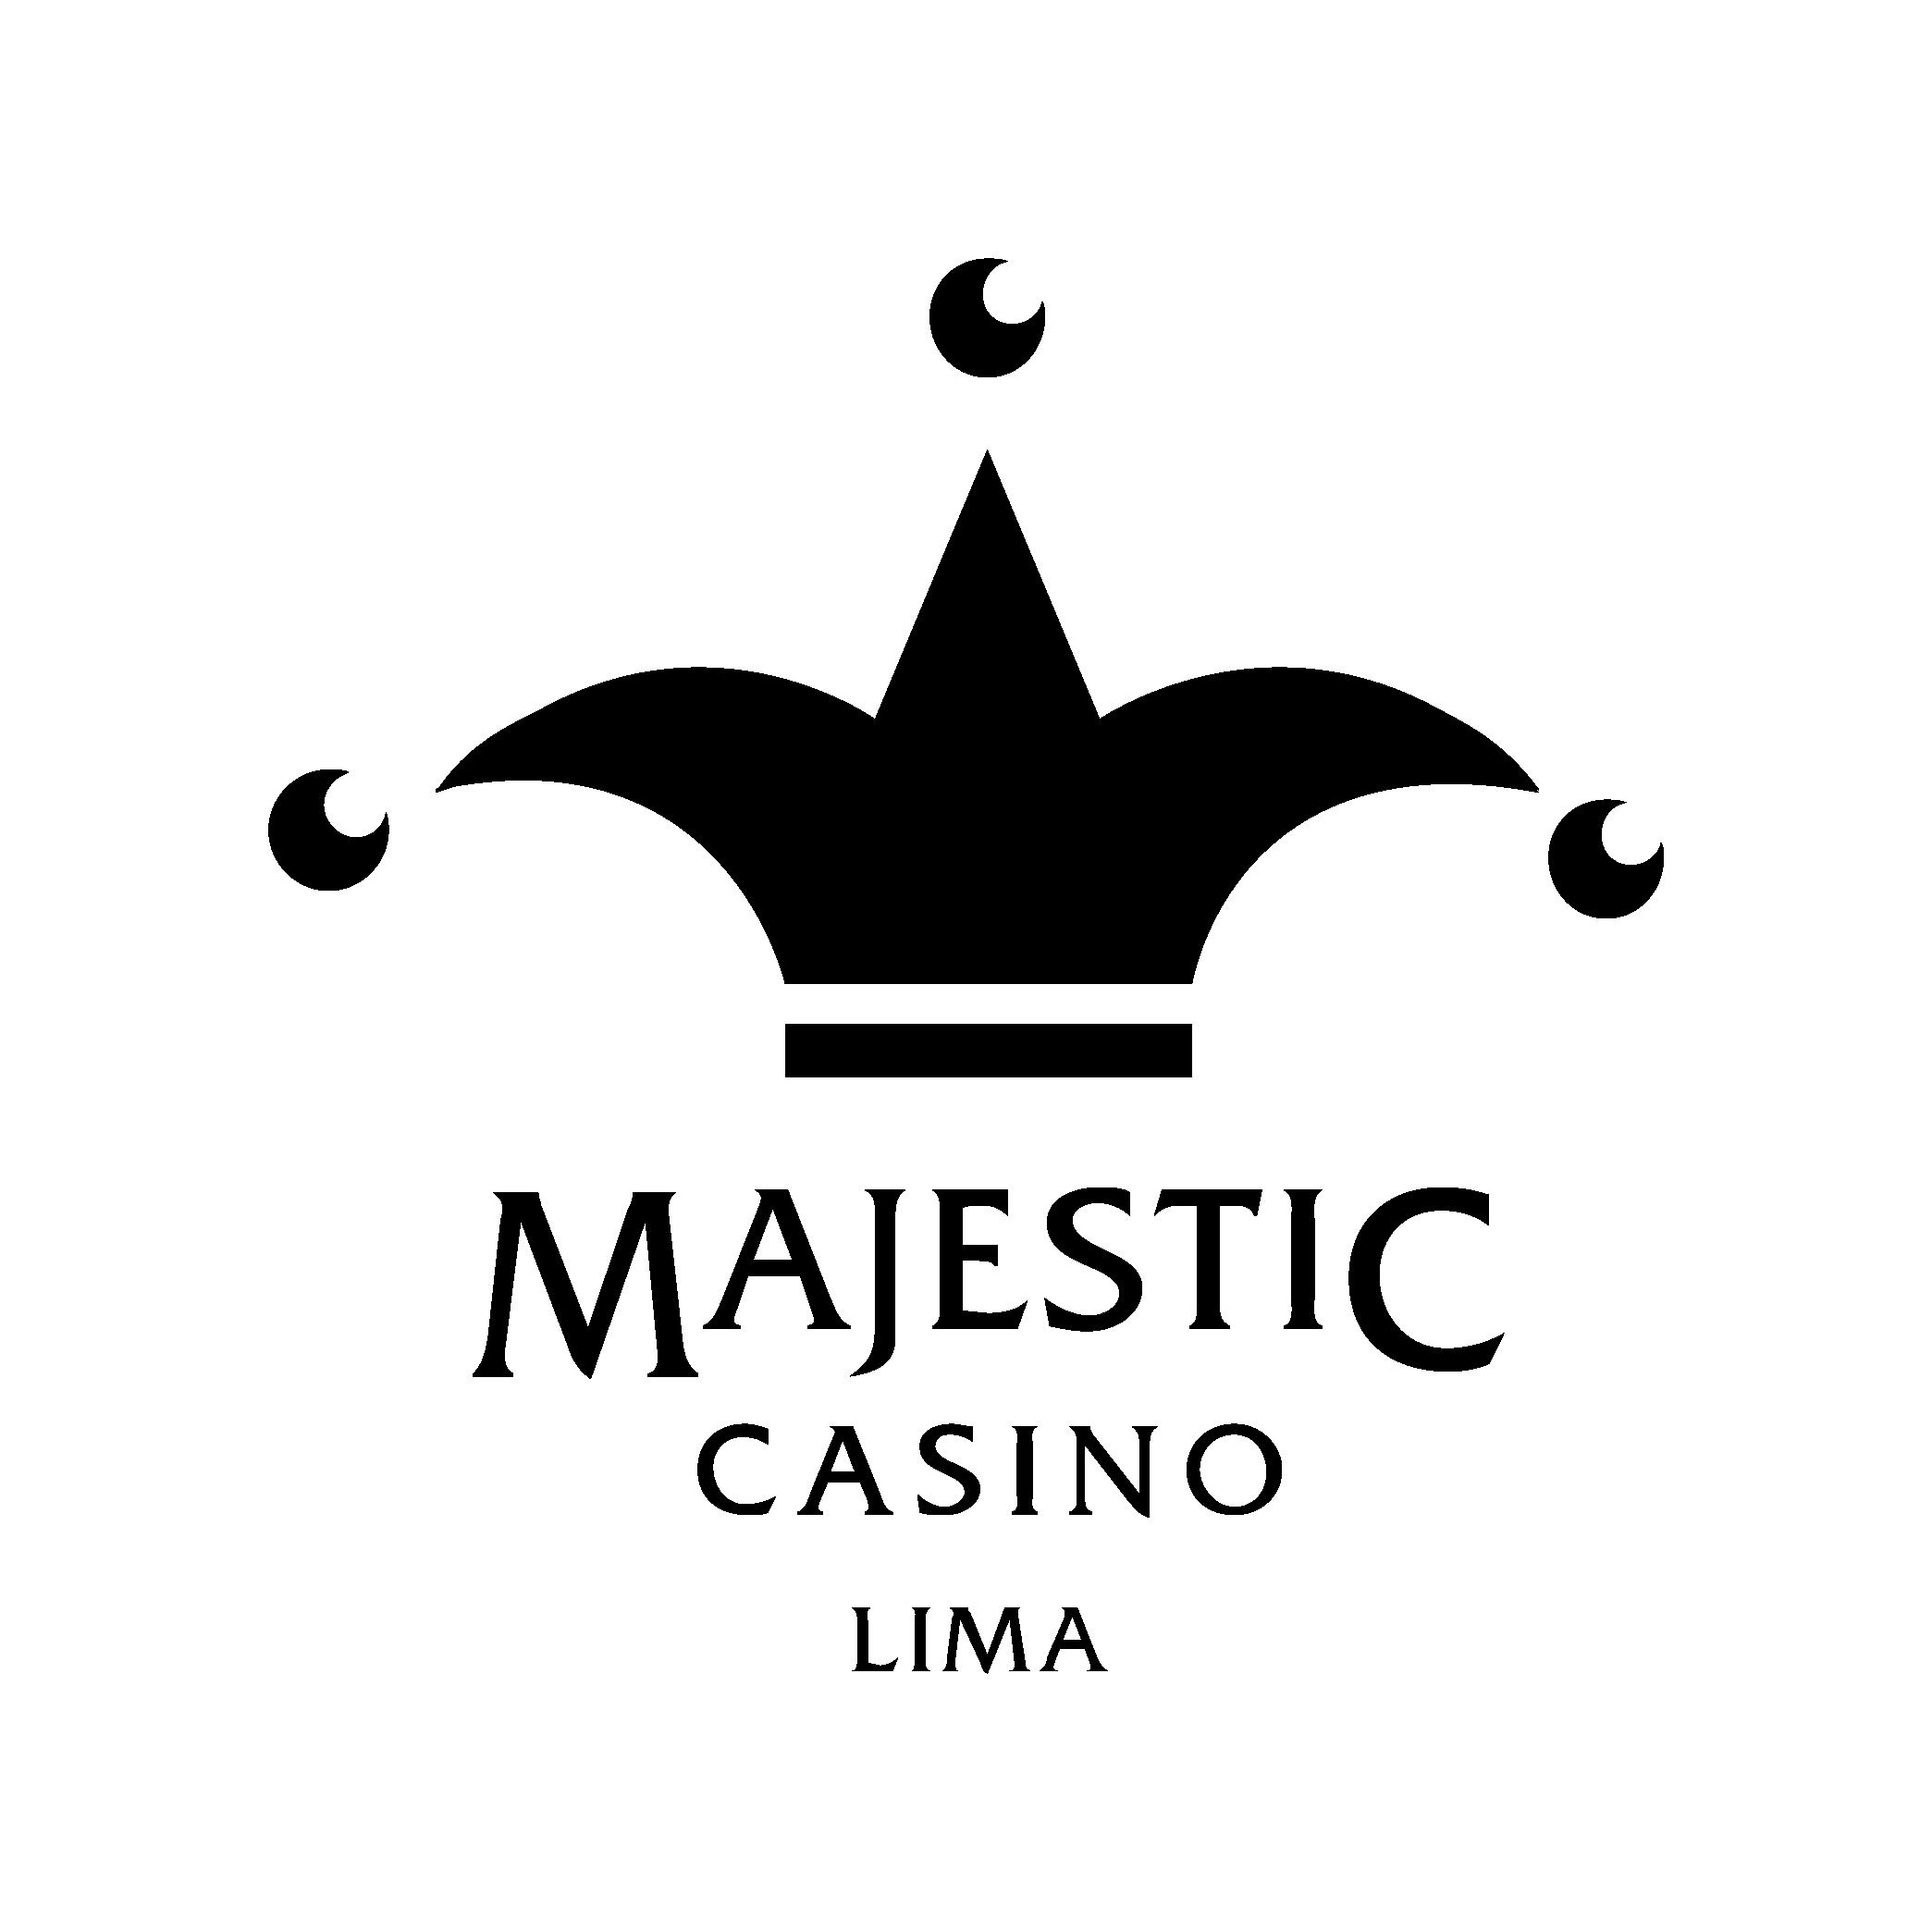 Logo Majestic Casino Lima Perú